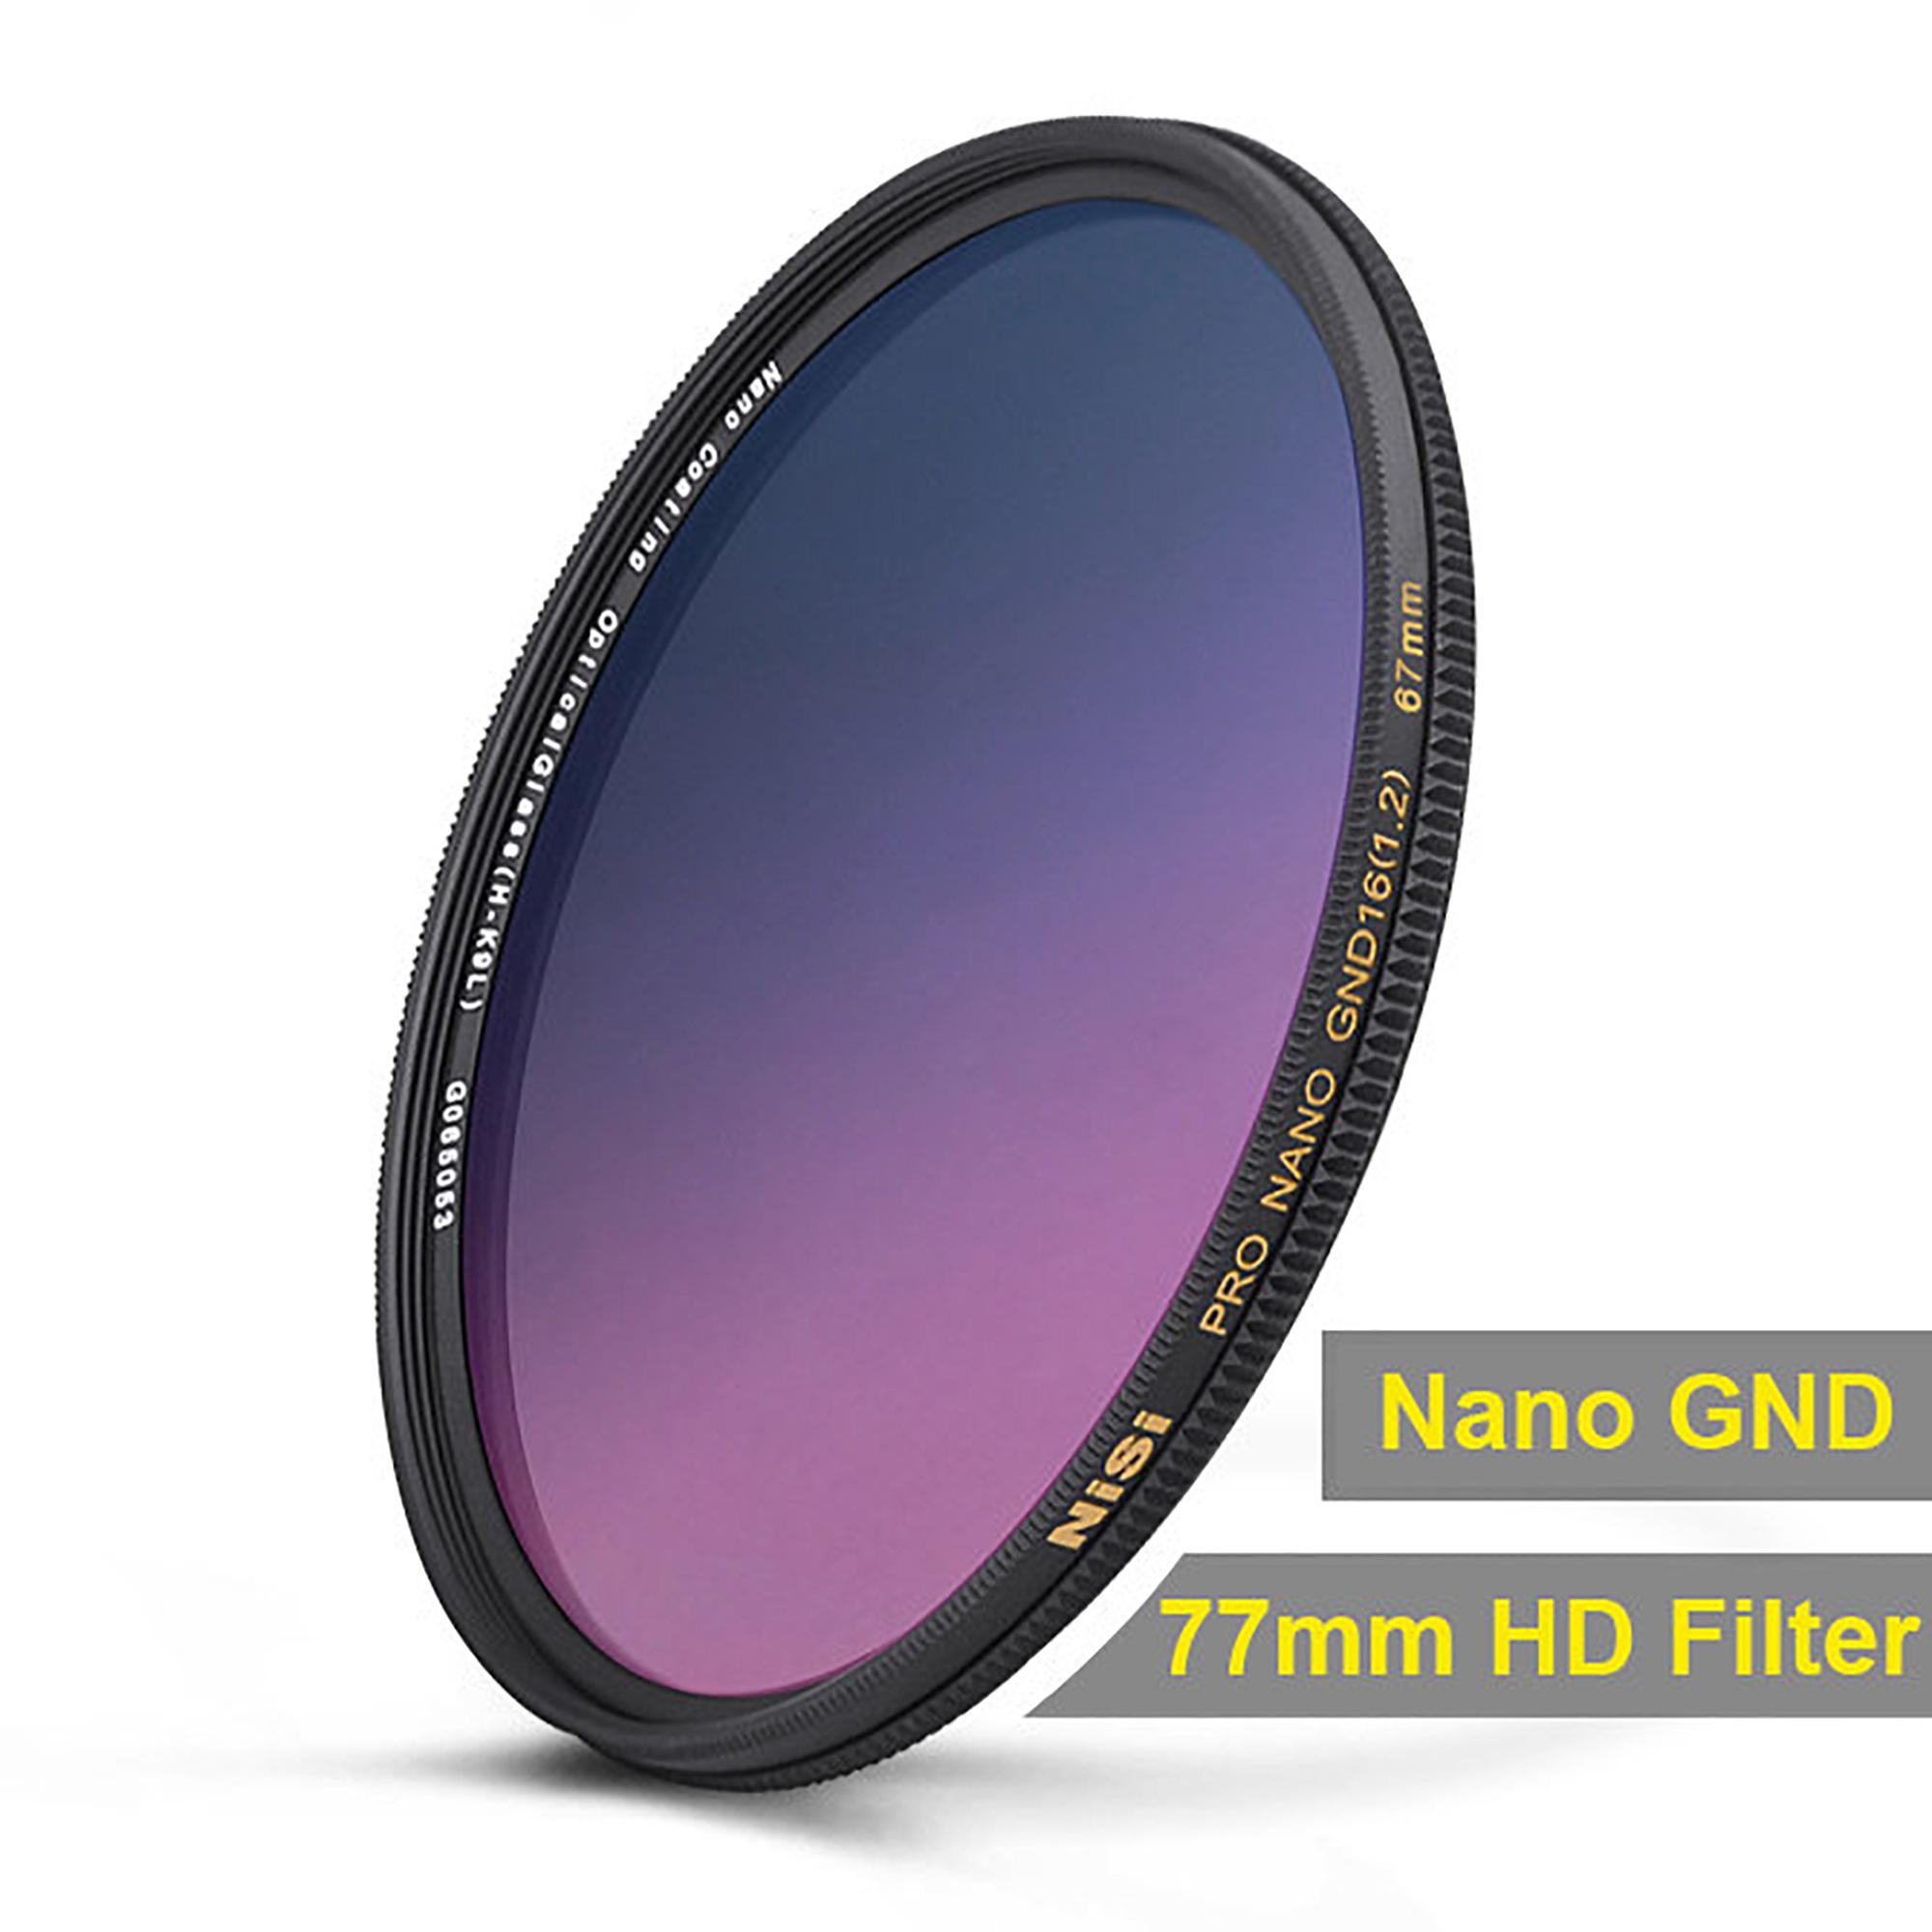 Circular Graduated ND Filters